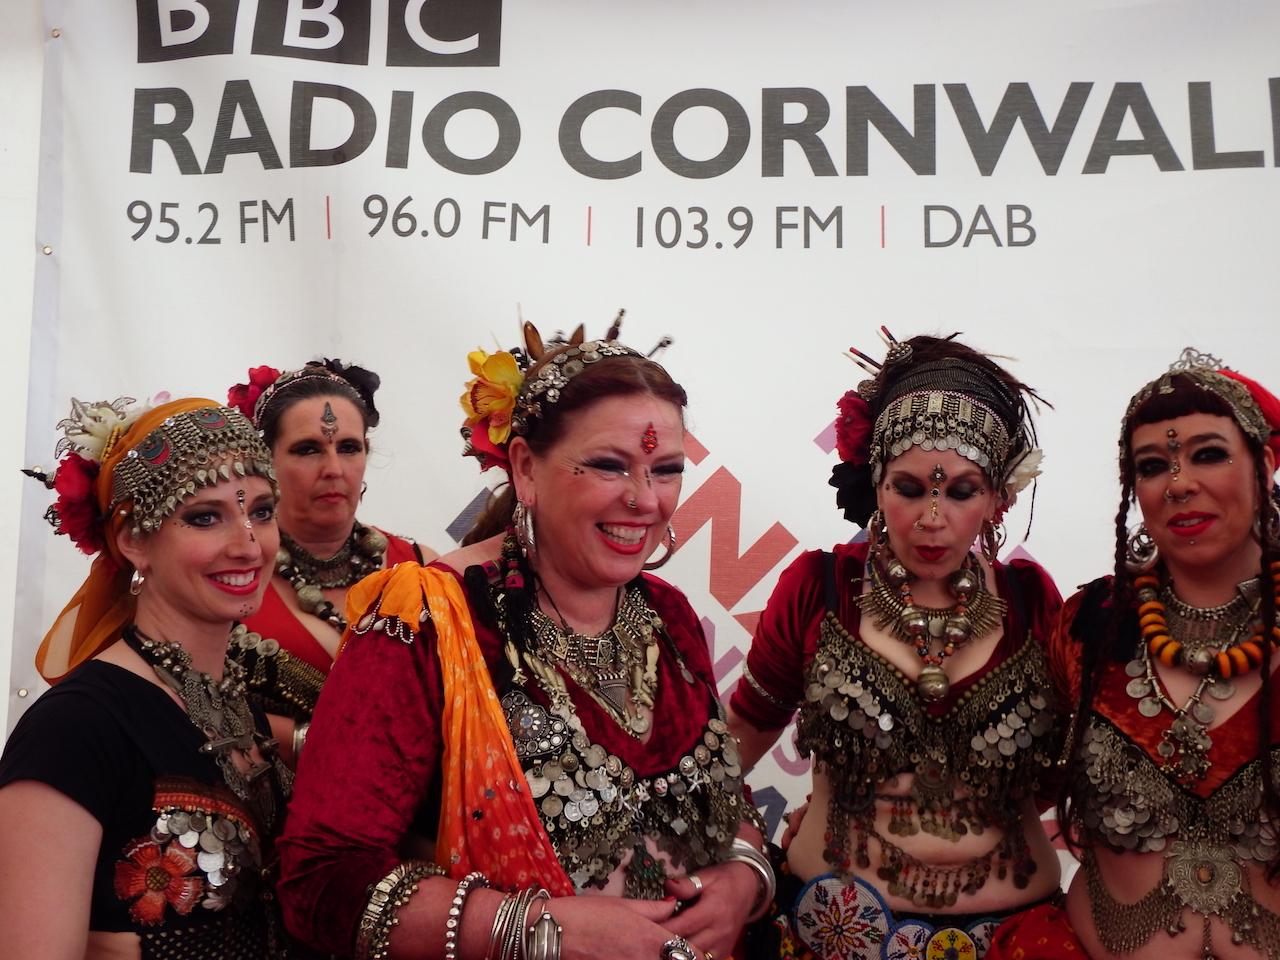 BBC Radio Cornwall